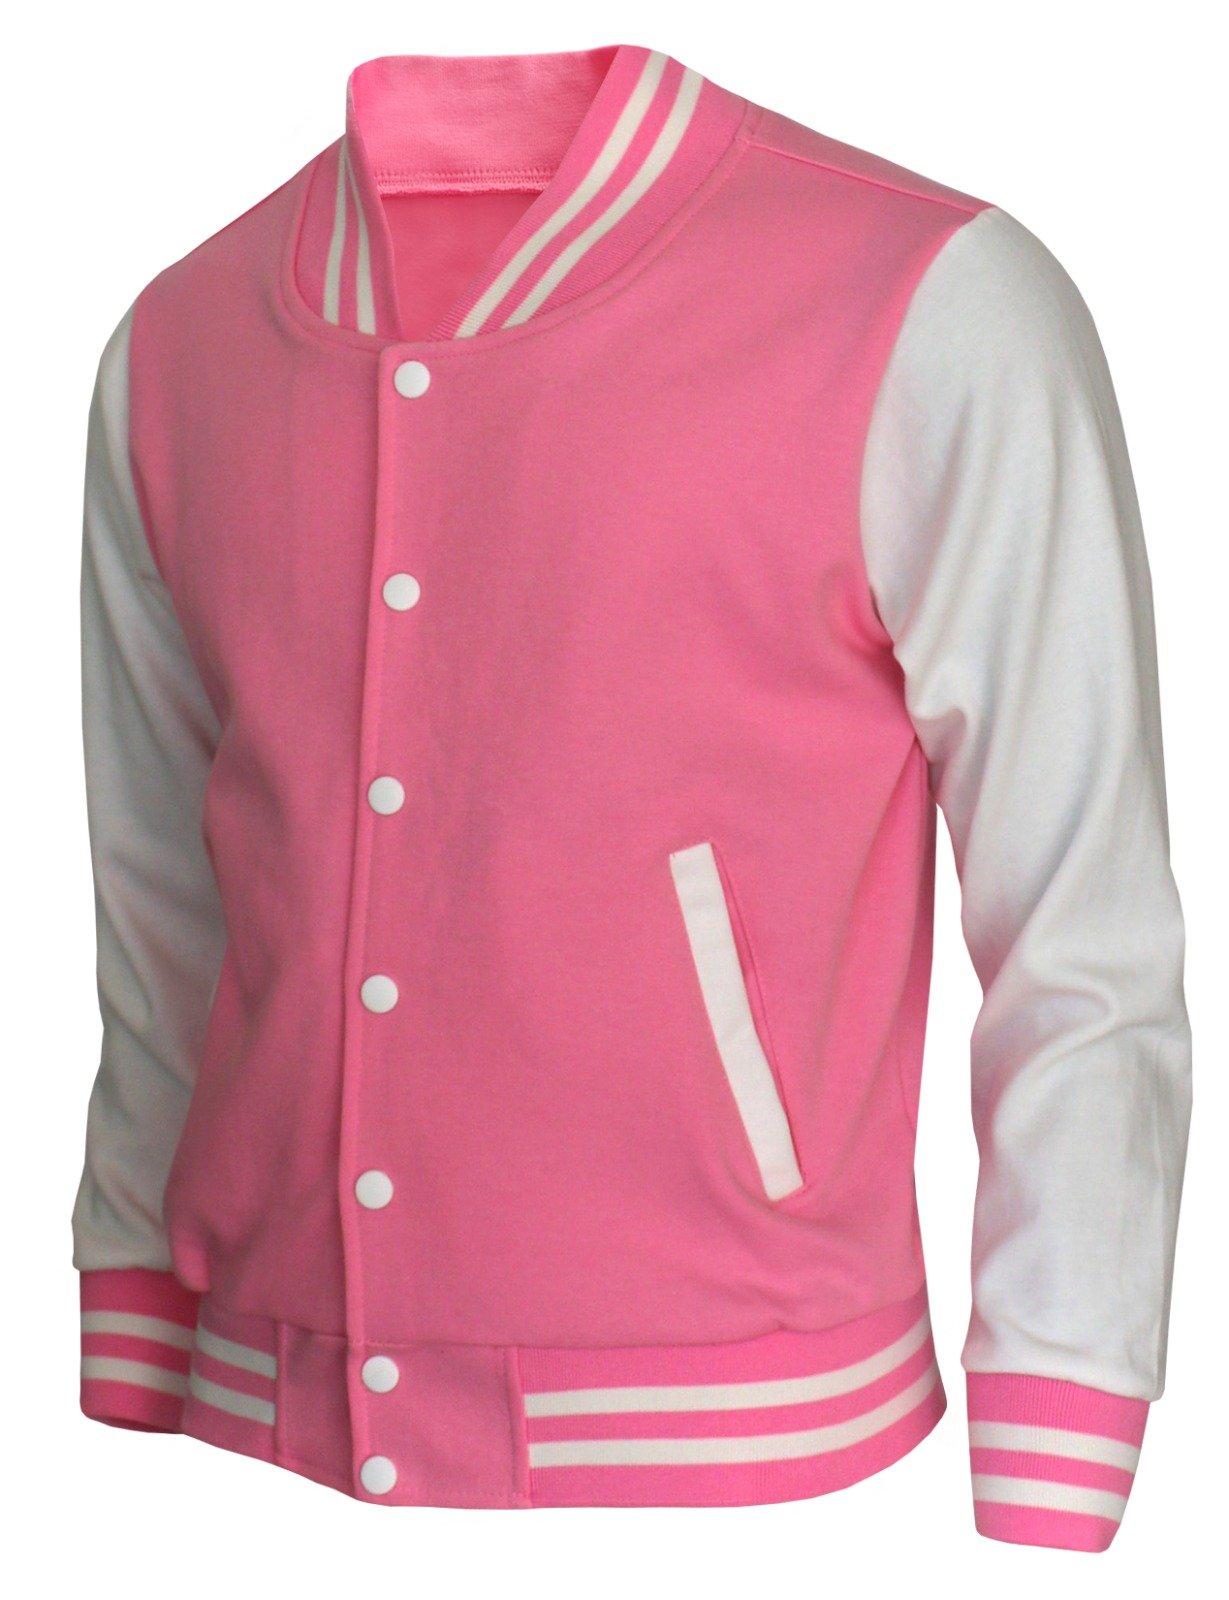 BCPOLO Baseball Jacket Varsity Baseball Cotton Jacket Letterman Jacket 8 Colors-Pink M by BCPOLO